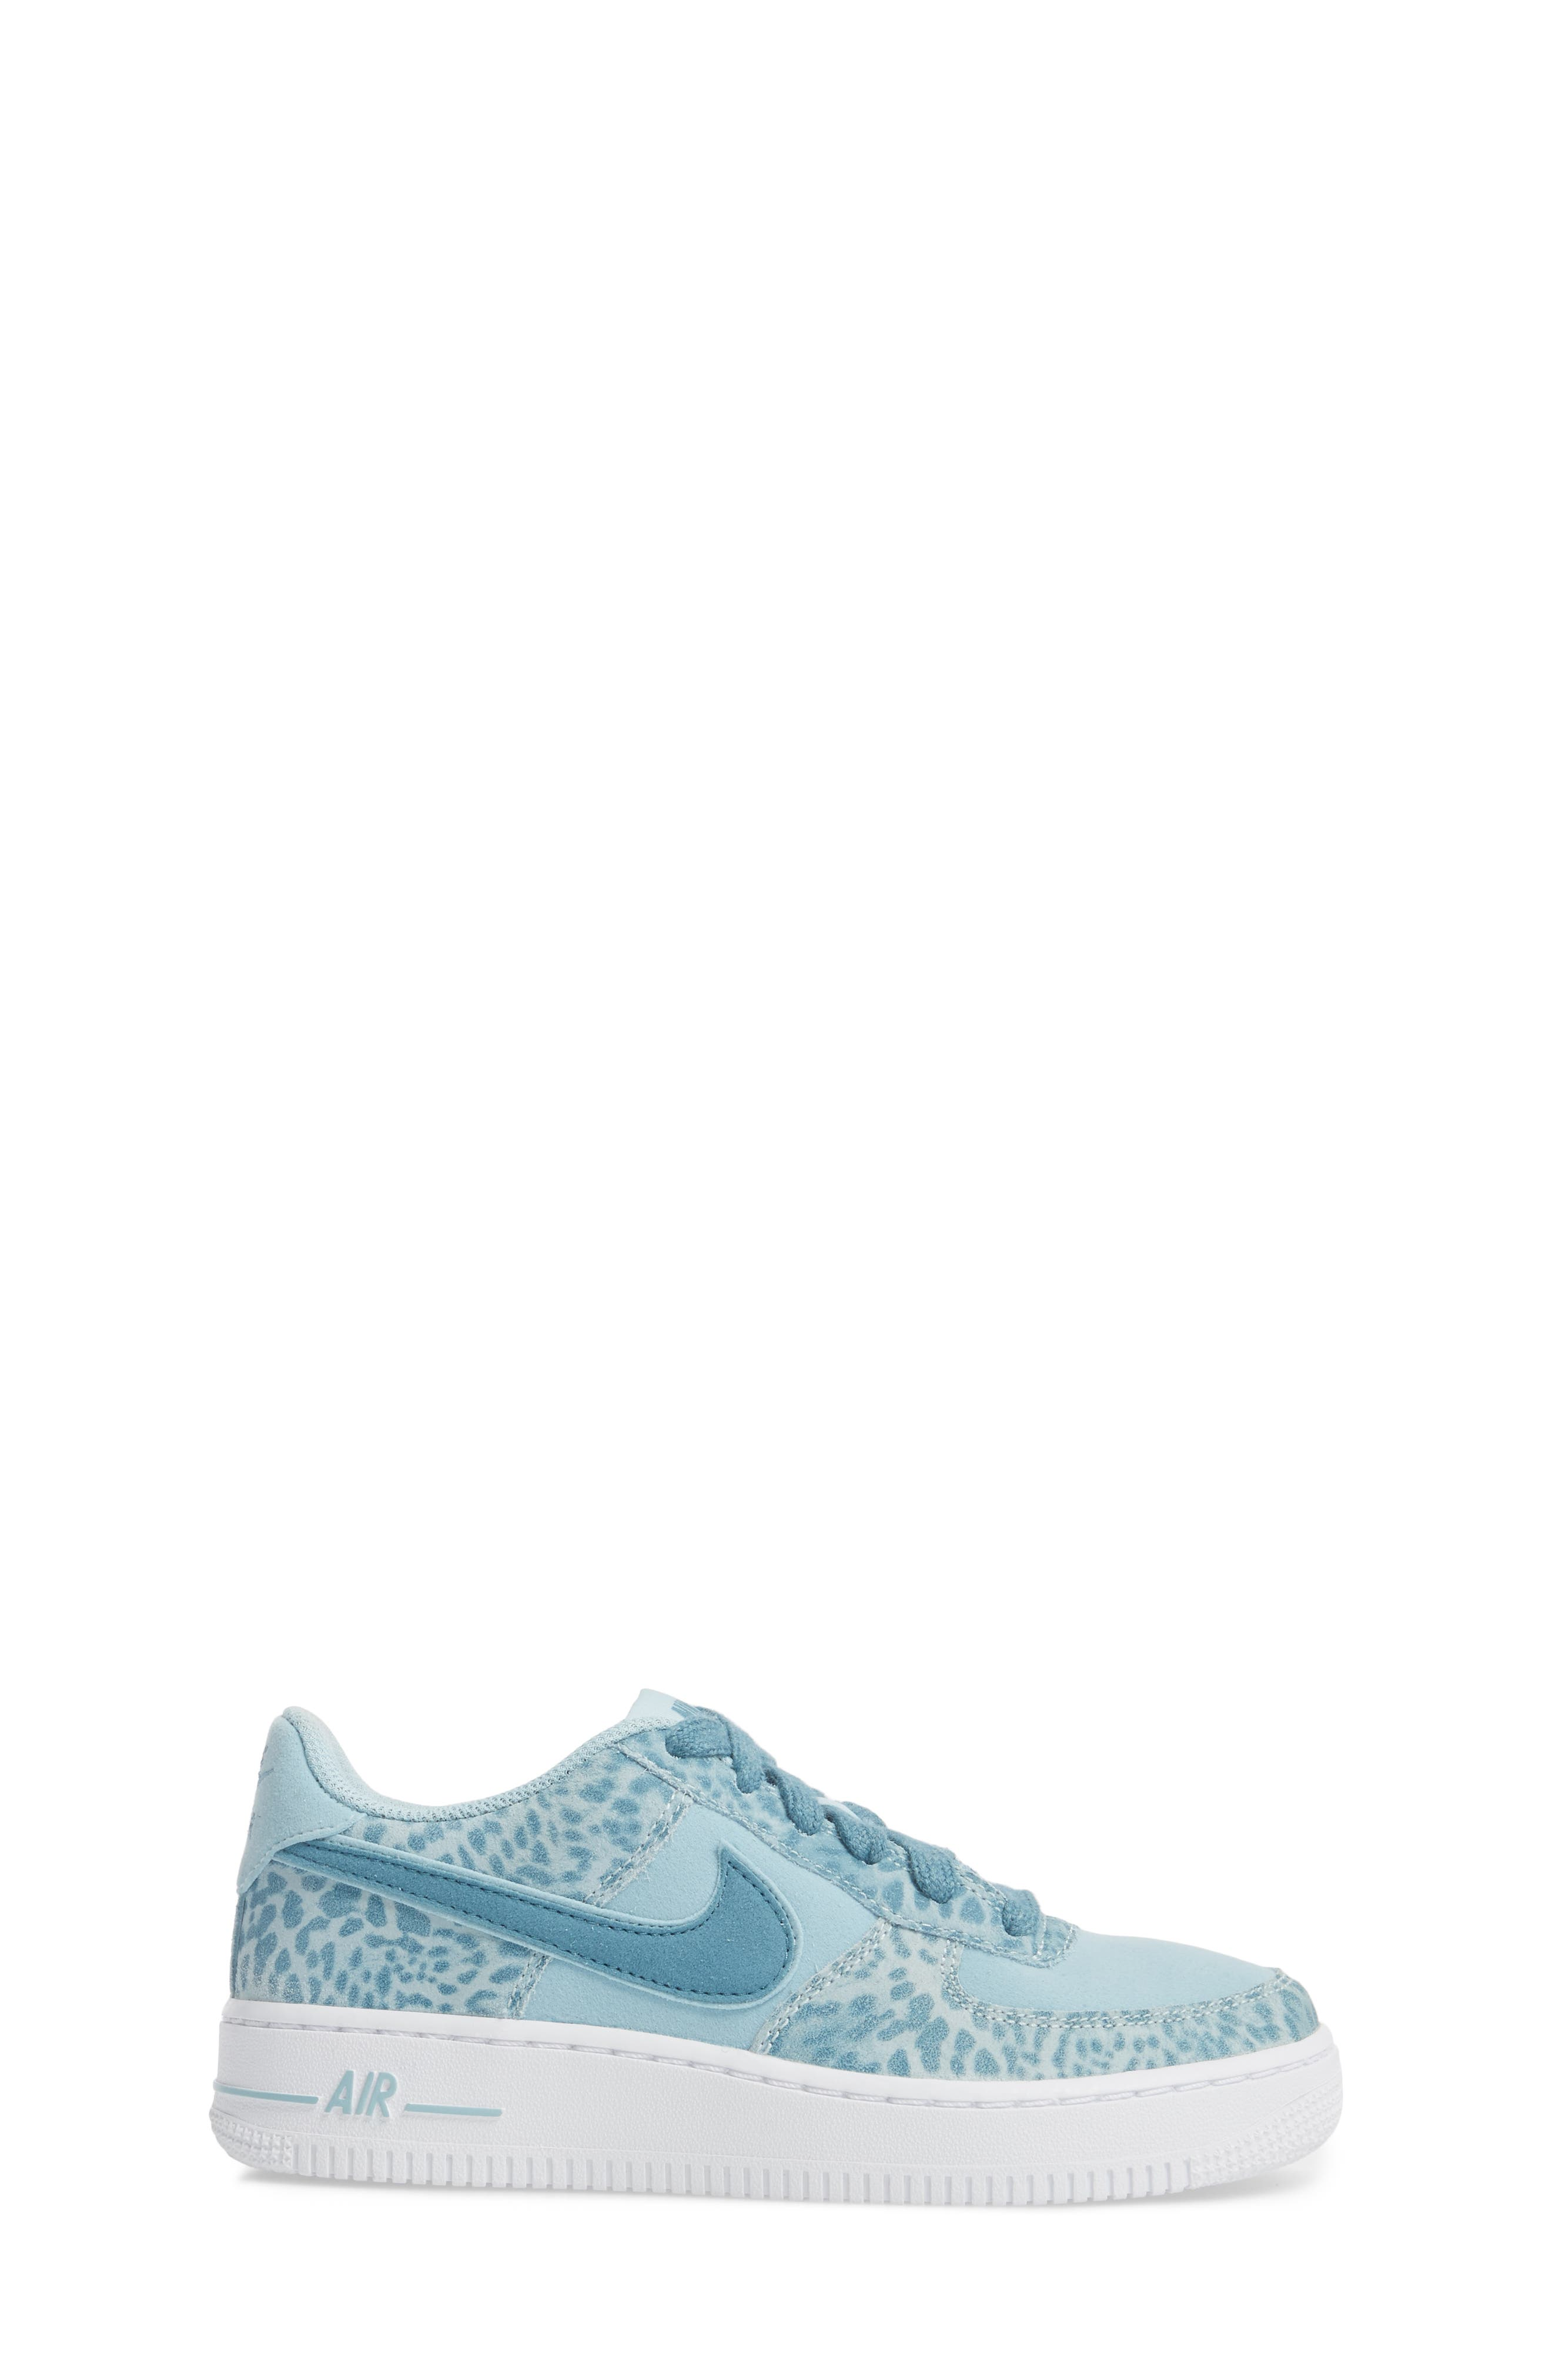 Air Force 1 LV8 Sneaker,                             Alternate thumbnail 12, color,